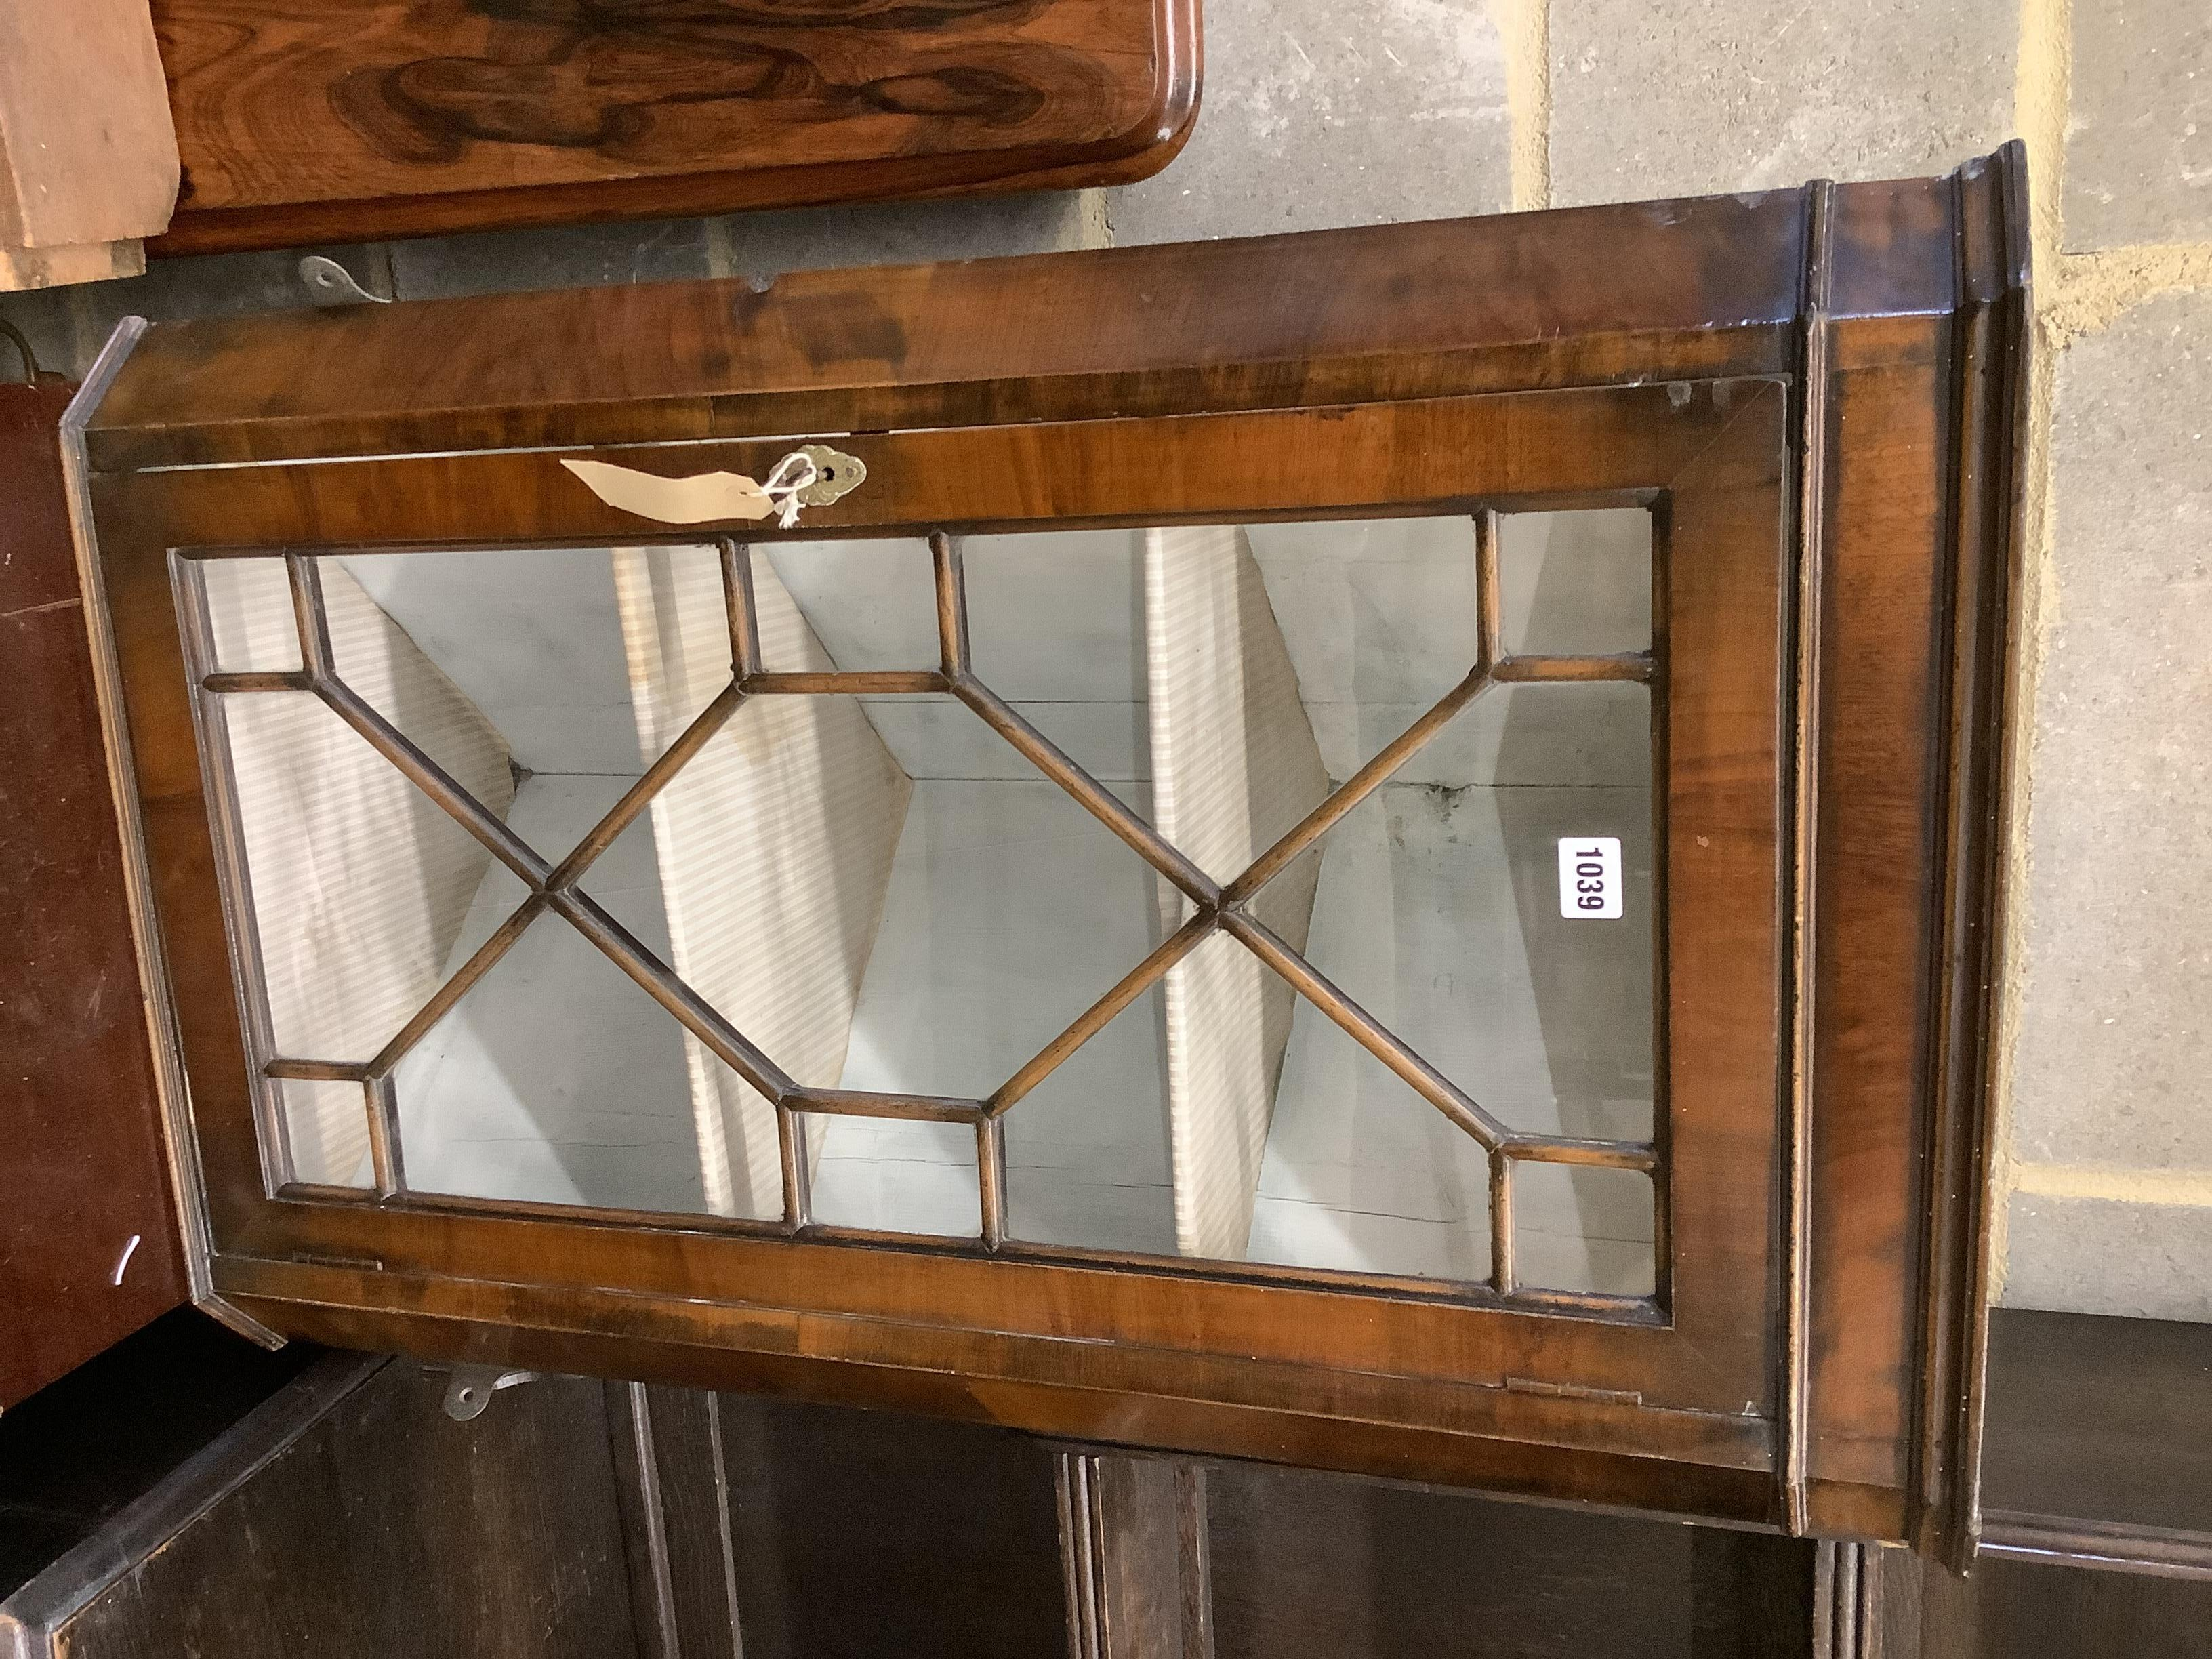 A Queen Anne style hanging corner cabinet, width 55cm, depth 32cm, height 83cm